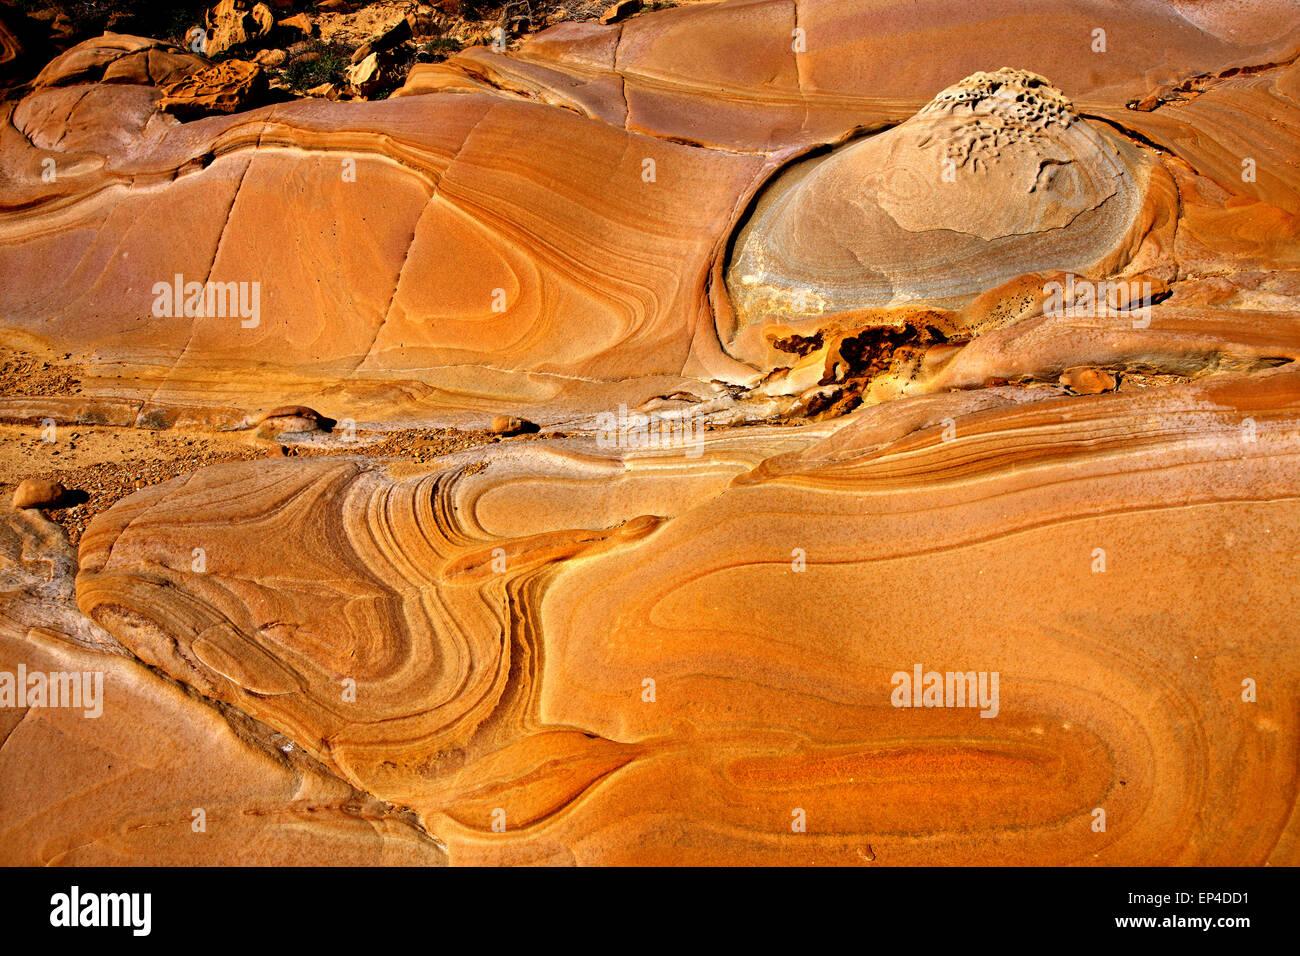 Amazing volcanic rocks at Faraklo (or 'Falakro') beach, Lemnos (Limnos) island, North Aegean, Greece. - Stock Image